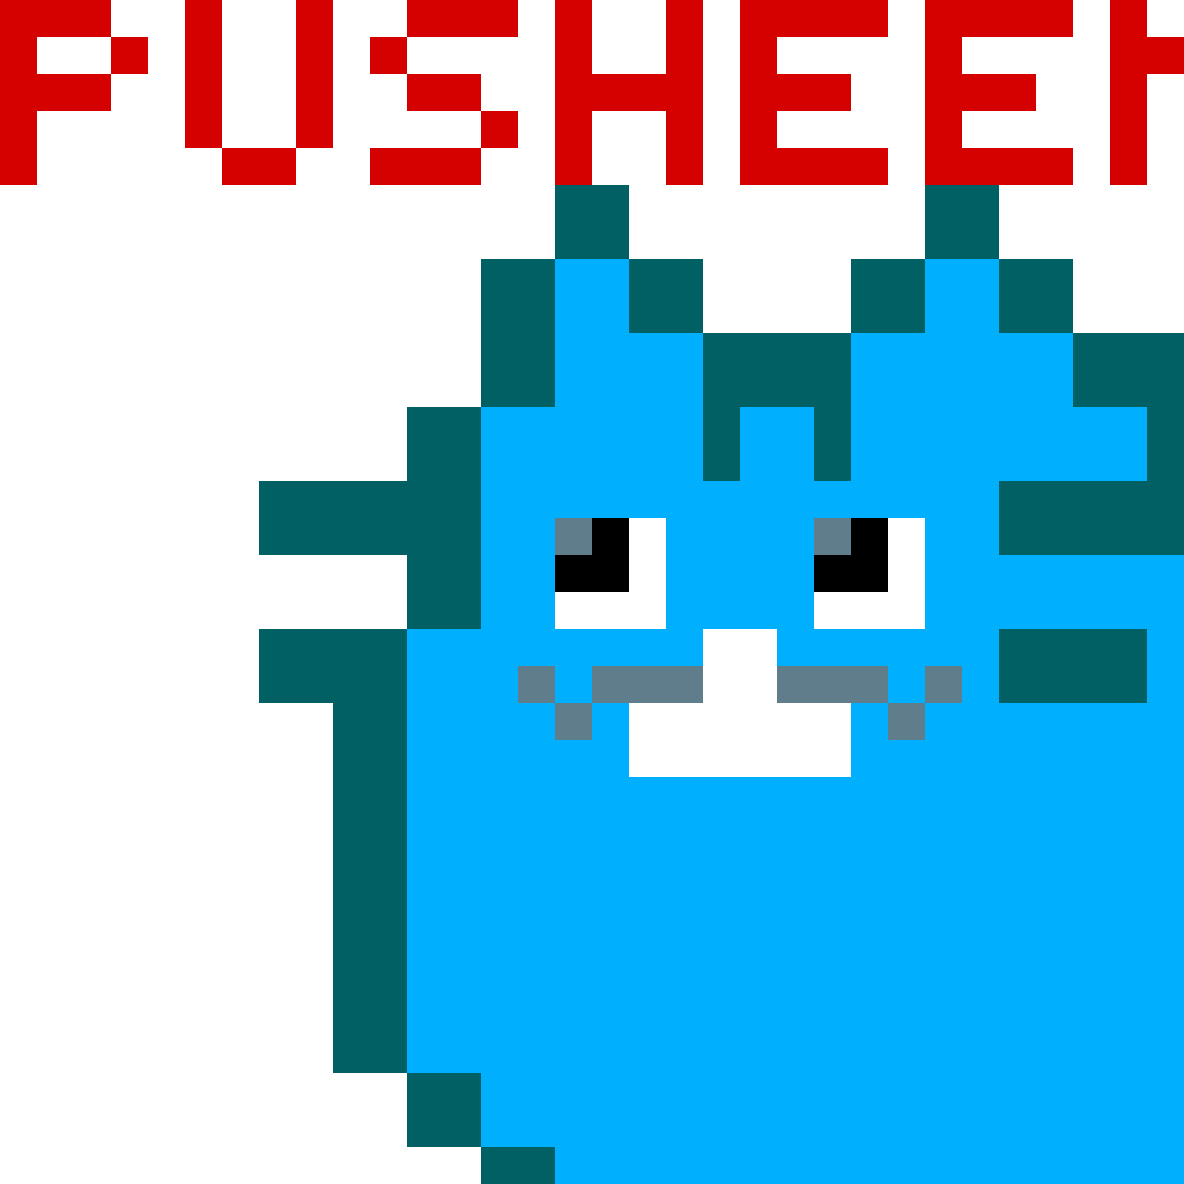 Pusheen de Fat (pusheen the cat) by minidancer24